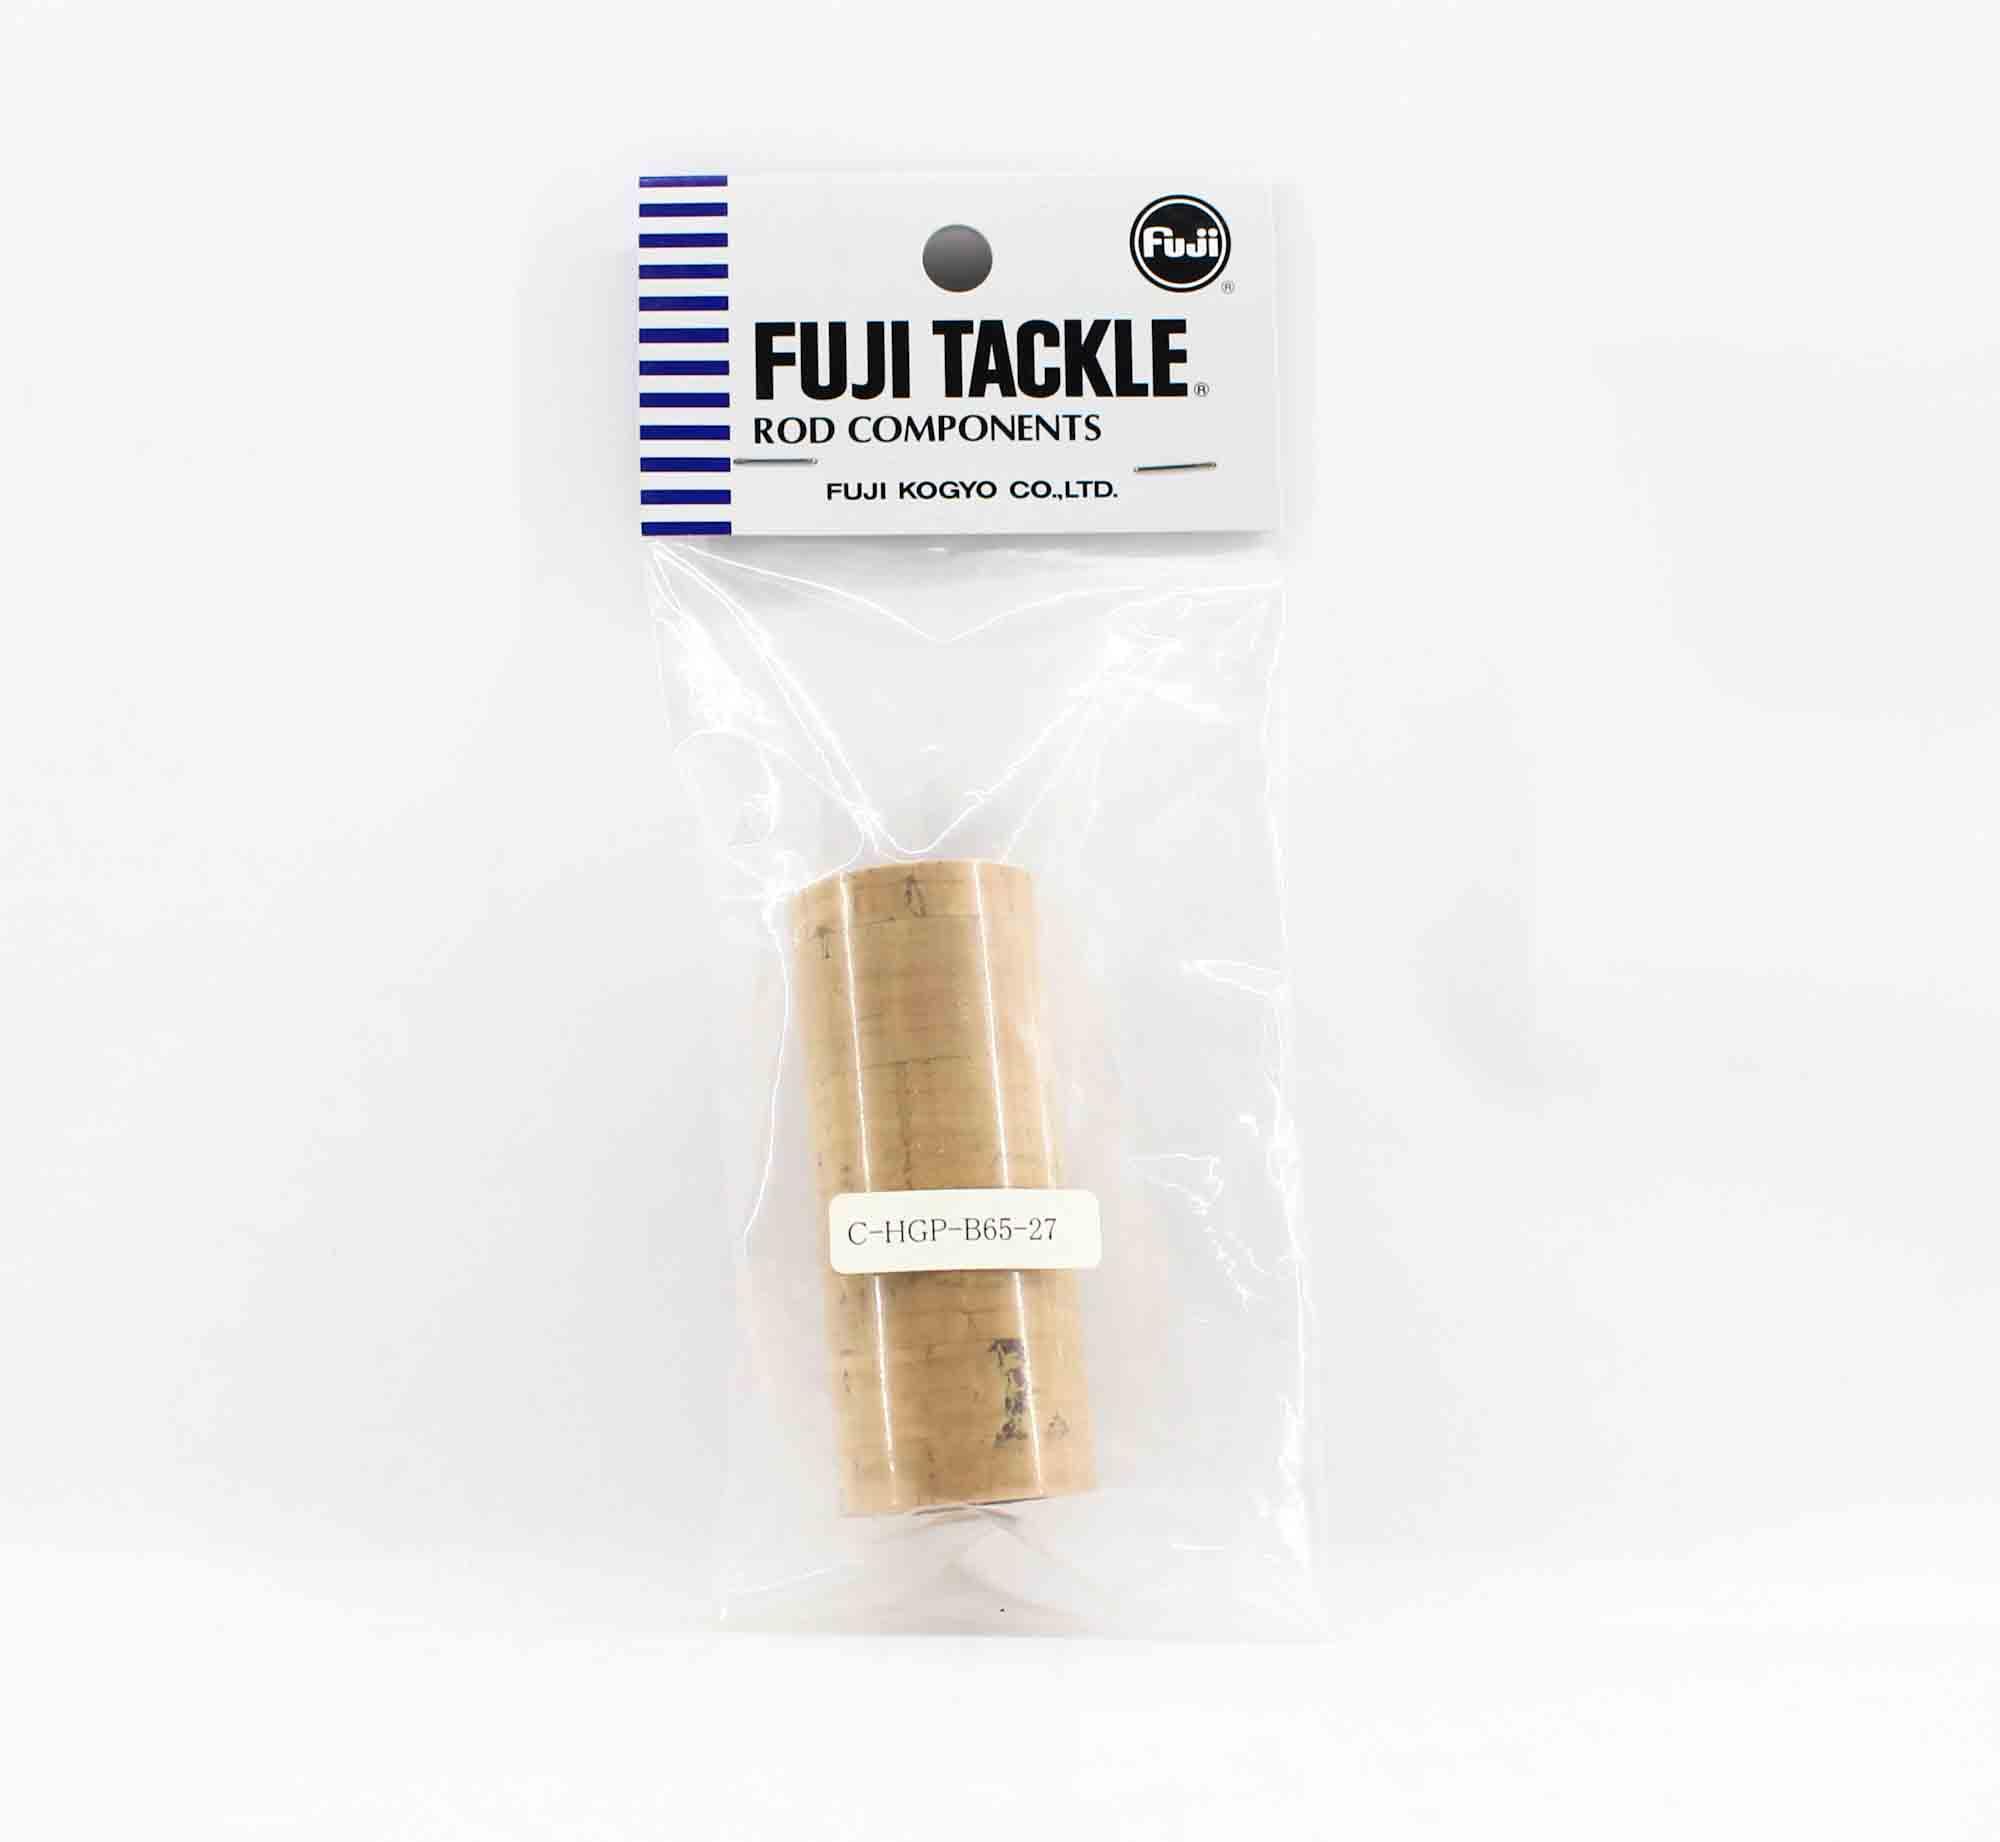 Fuji C-HGPB Size 65-27 Cork Rod Handle (6355)